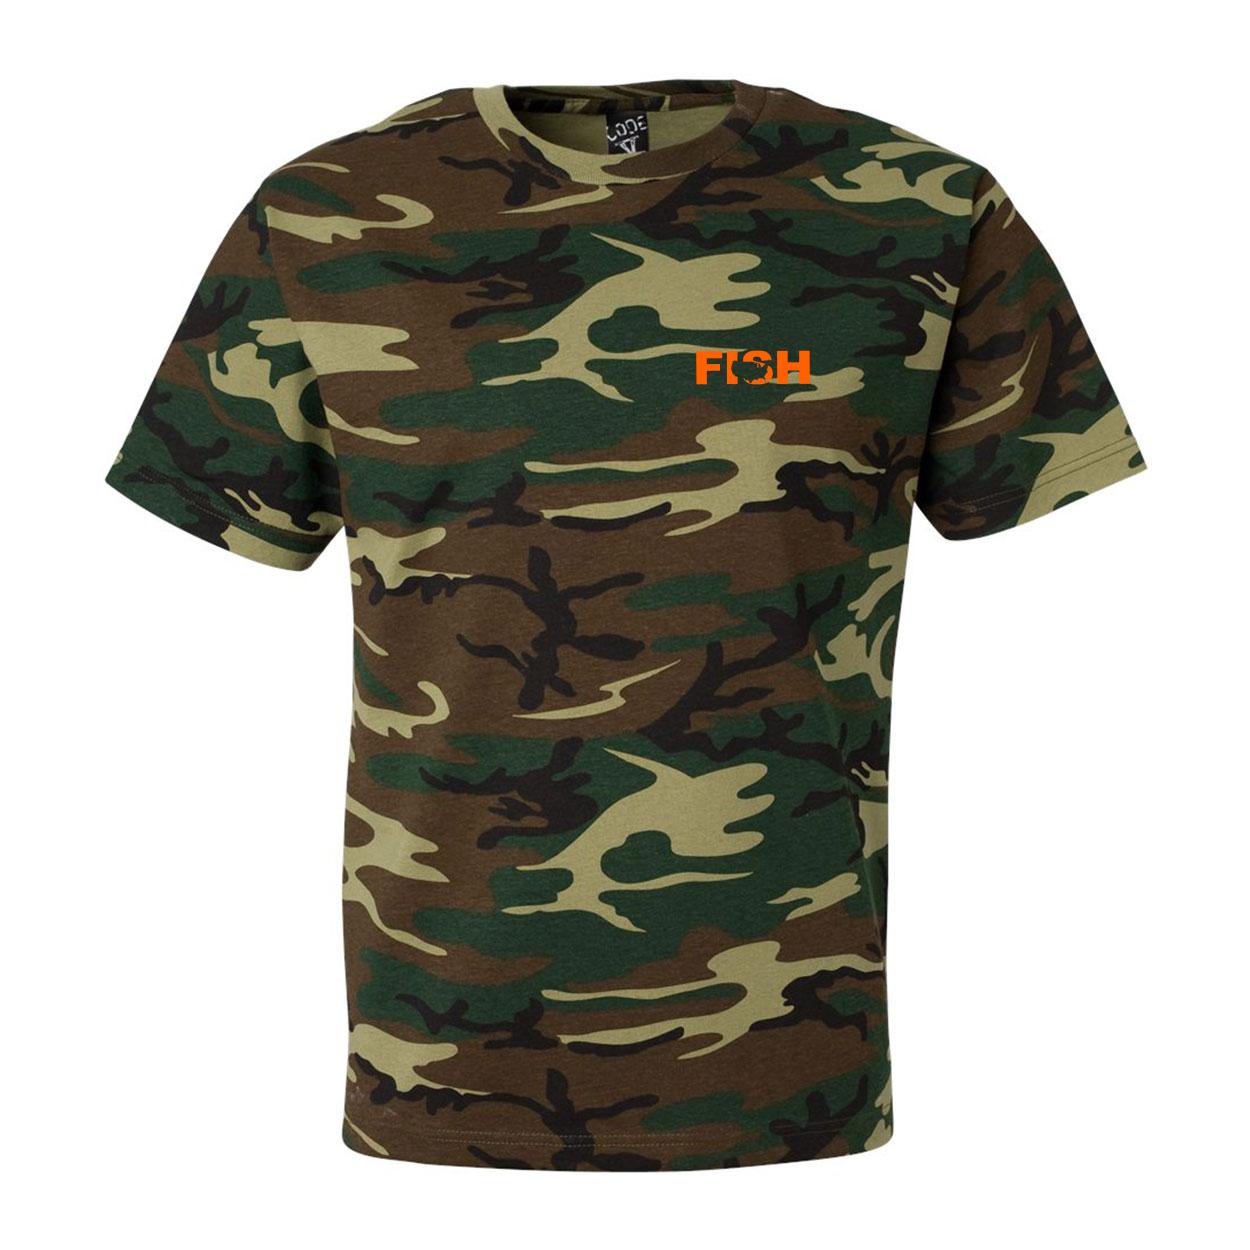 Fish United States Night Out Premium T-Shirt Camo (Orange Logo)